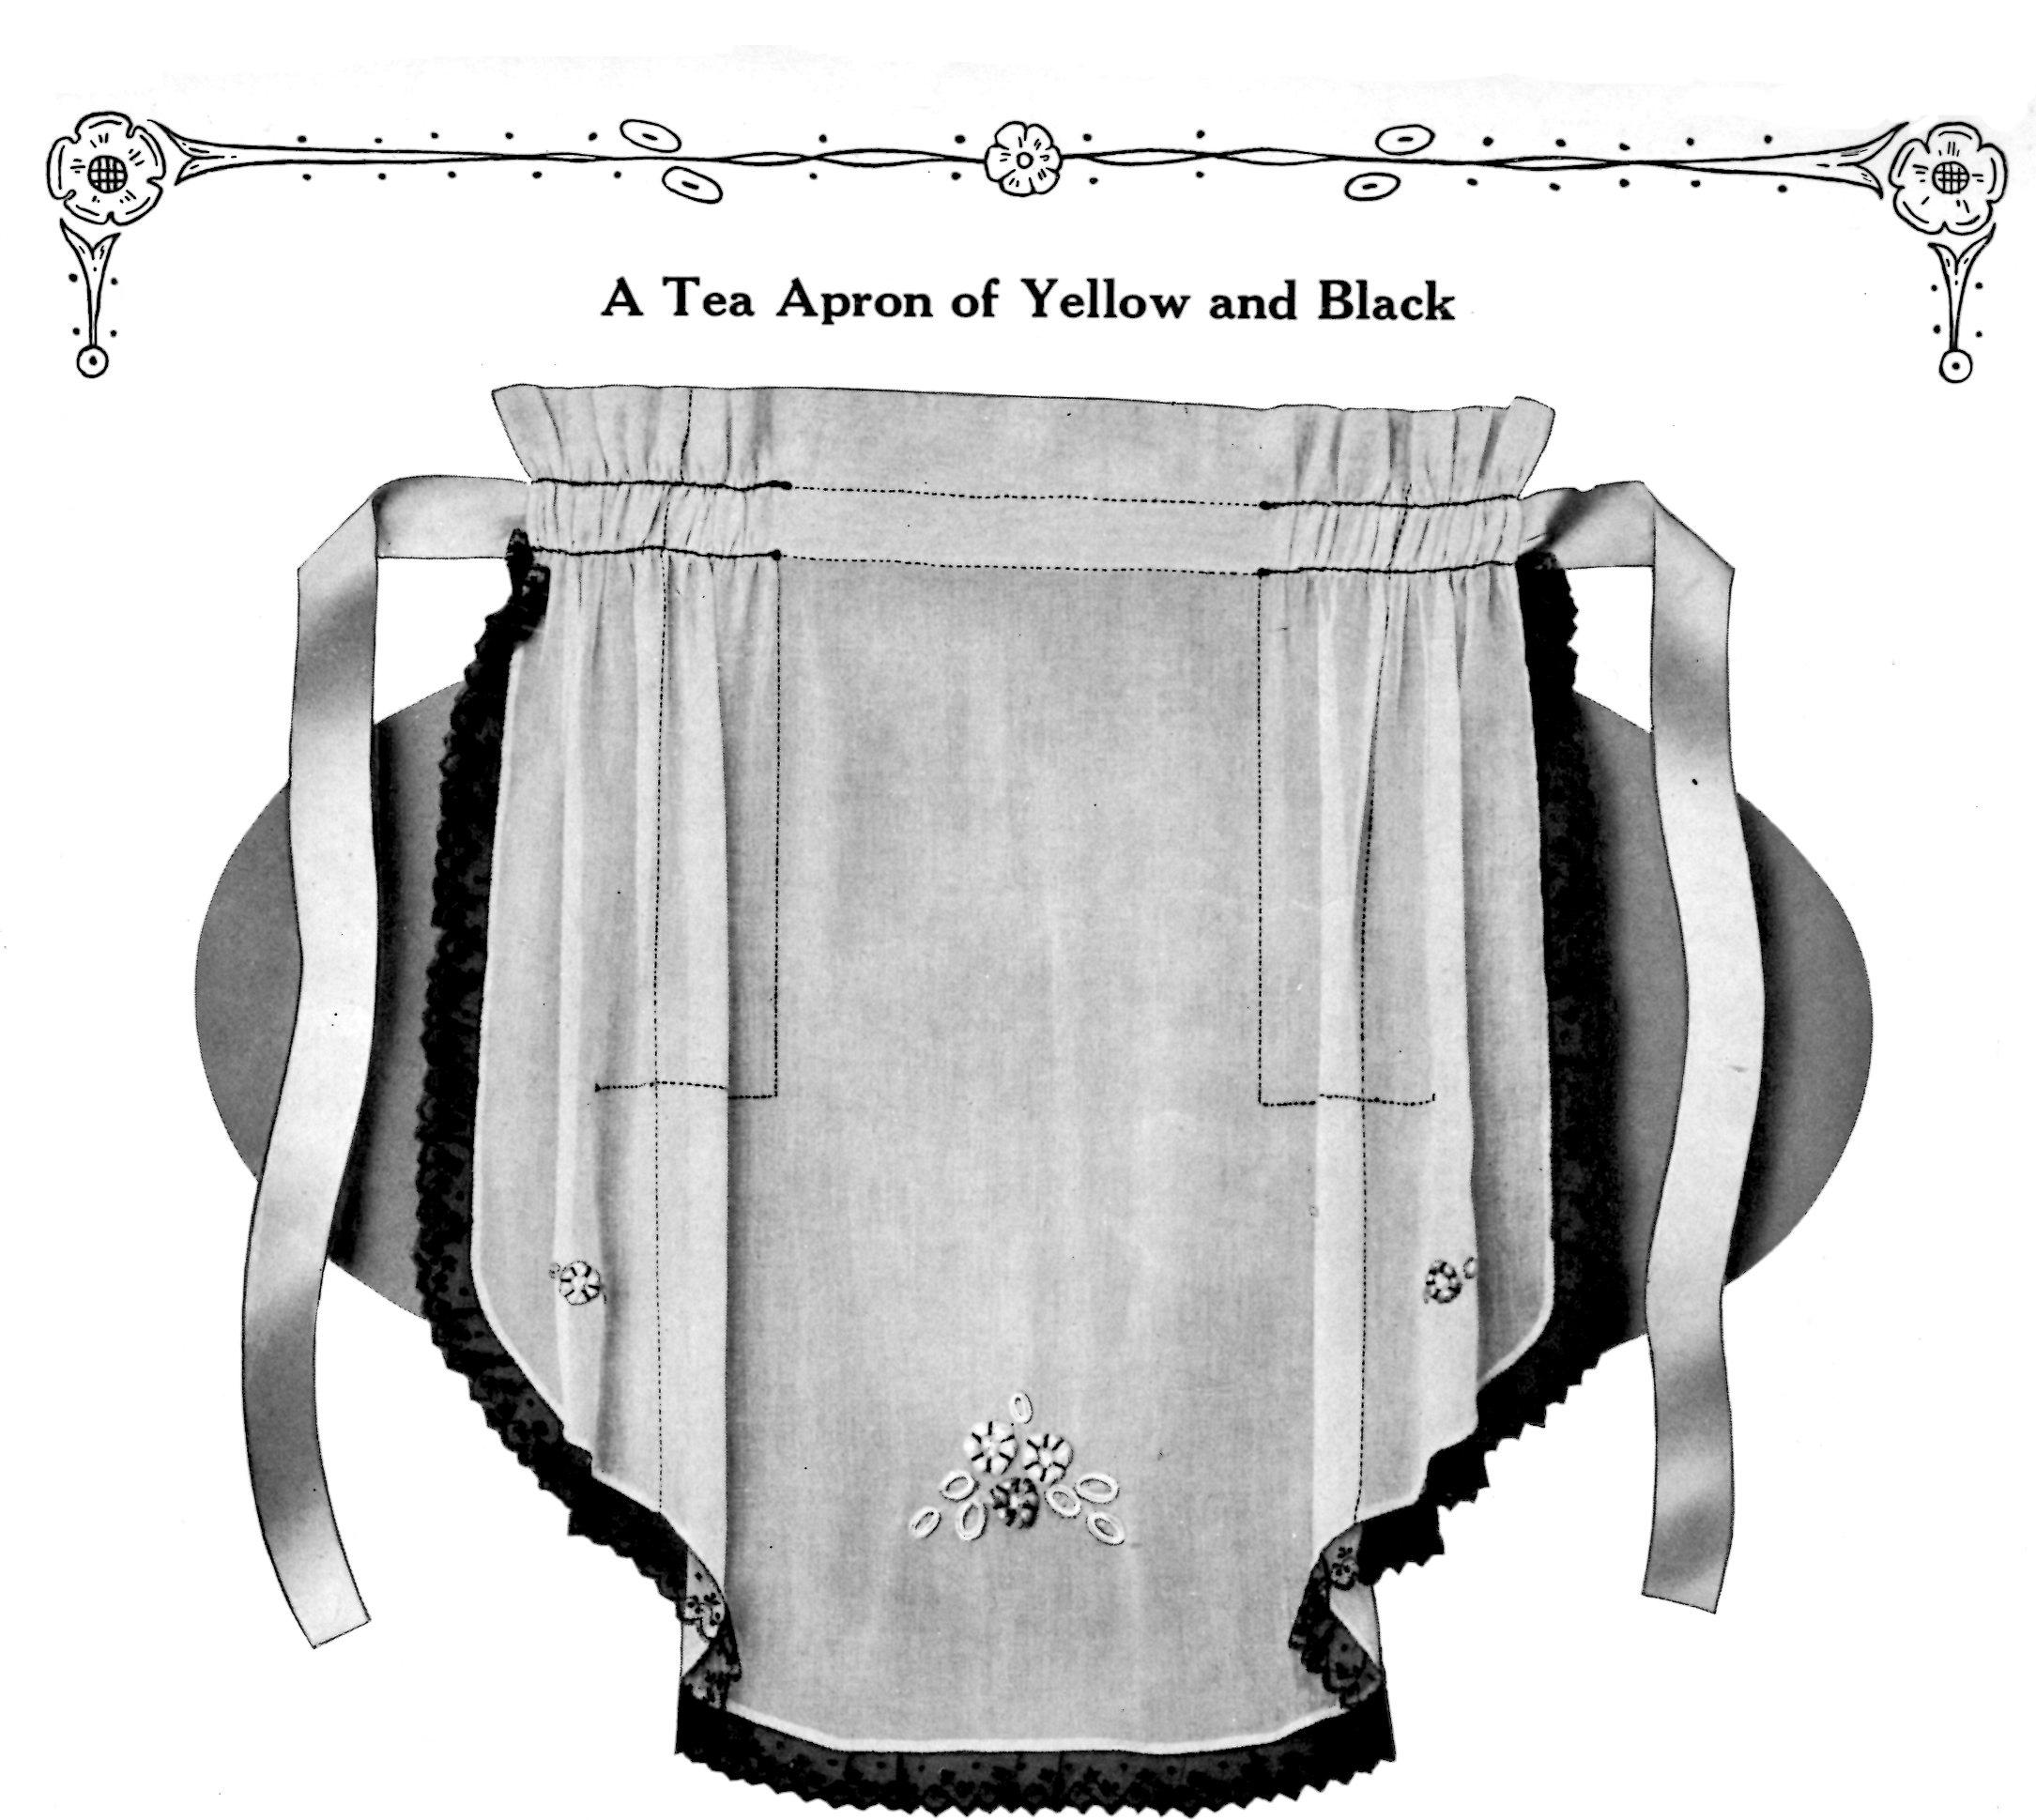 White tea apron - A Tea Apron Vintage Crafts And More